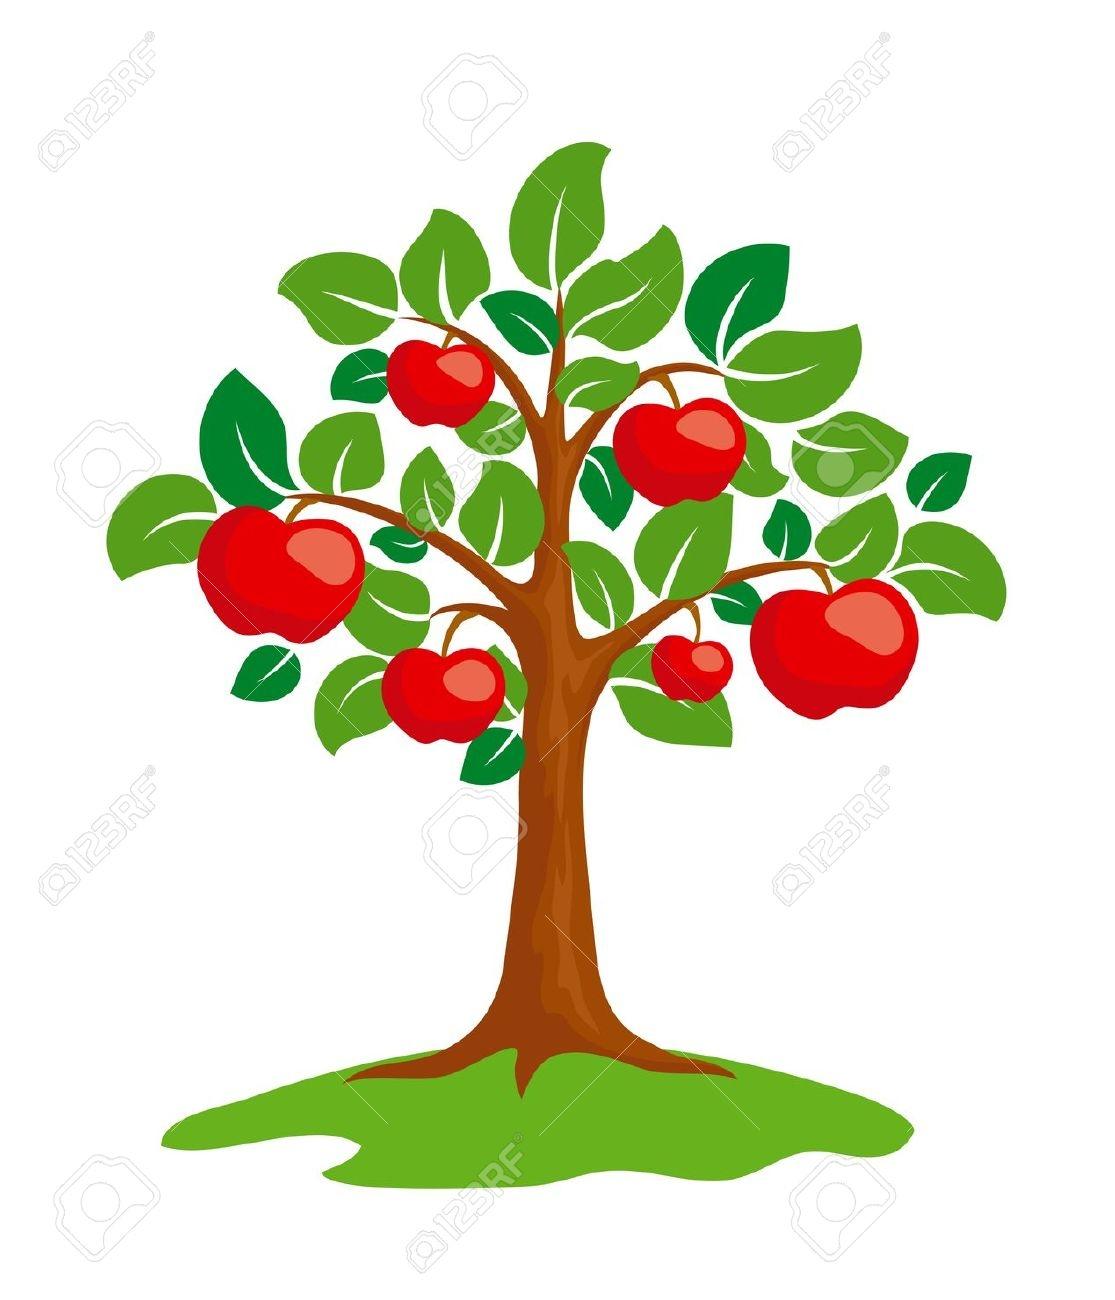 Apple Tree Clipart - .-Apple Tree Clipart - .-7